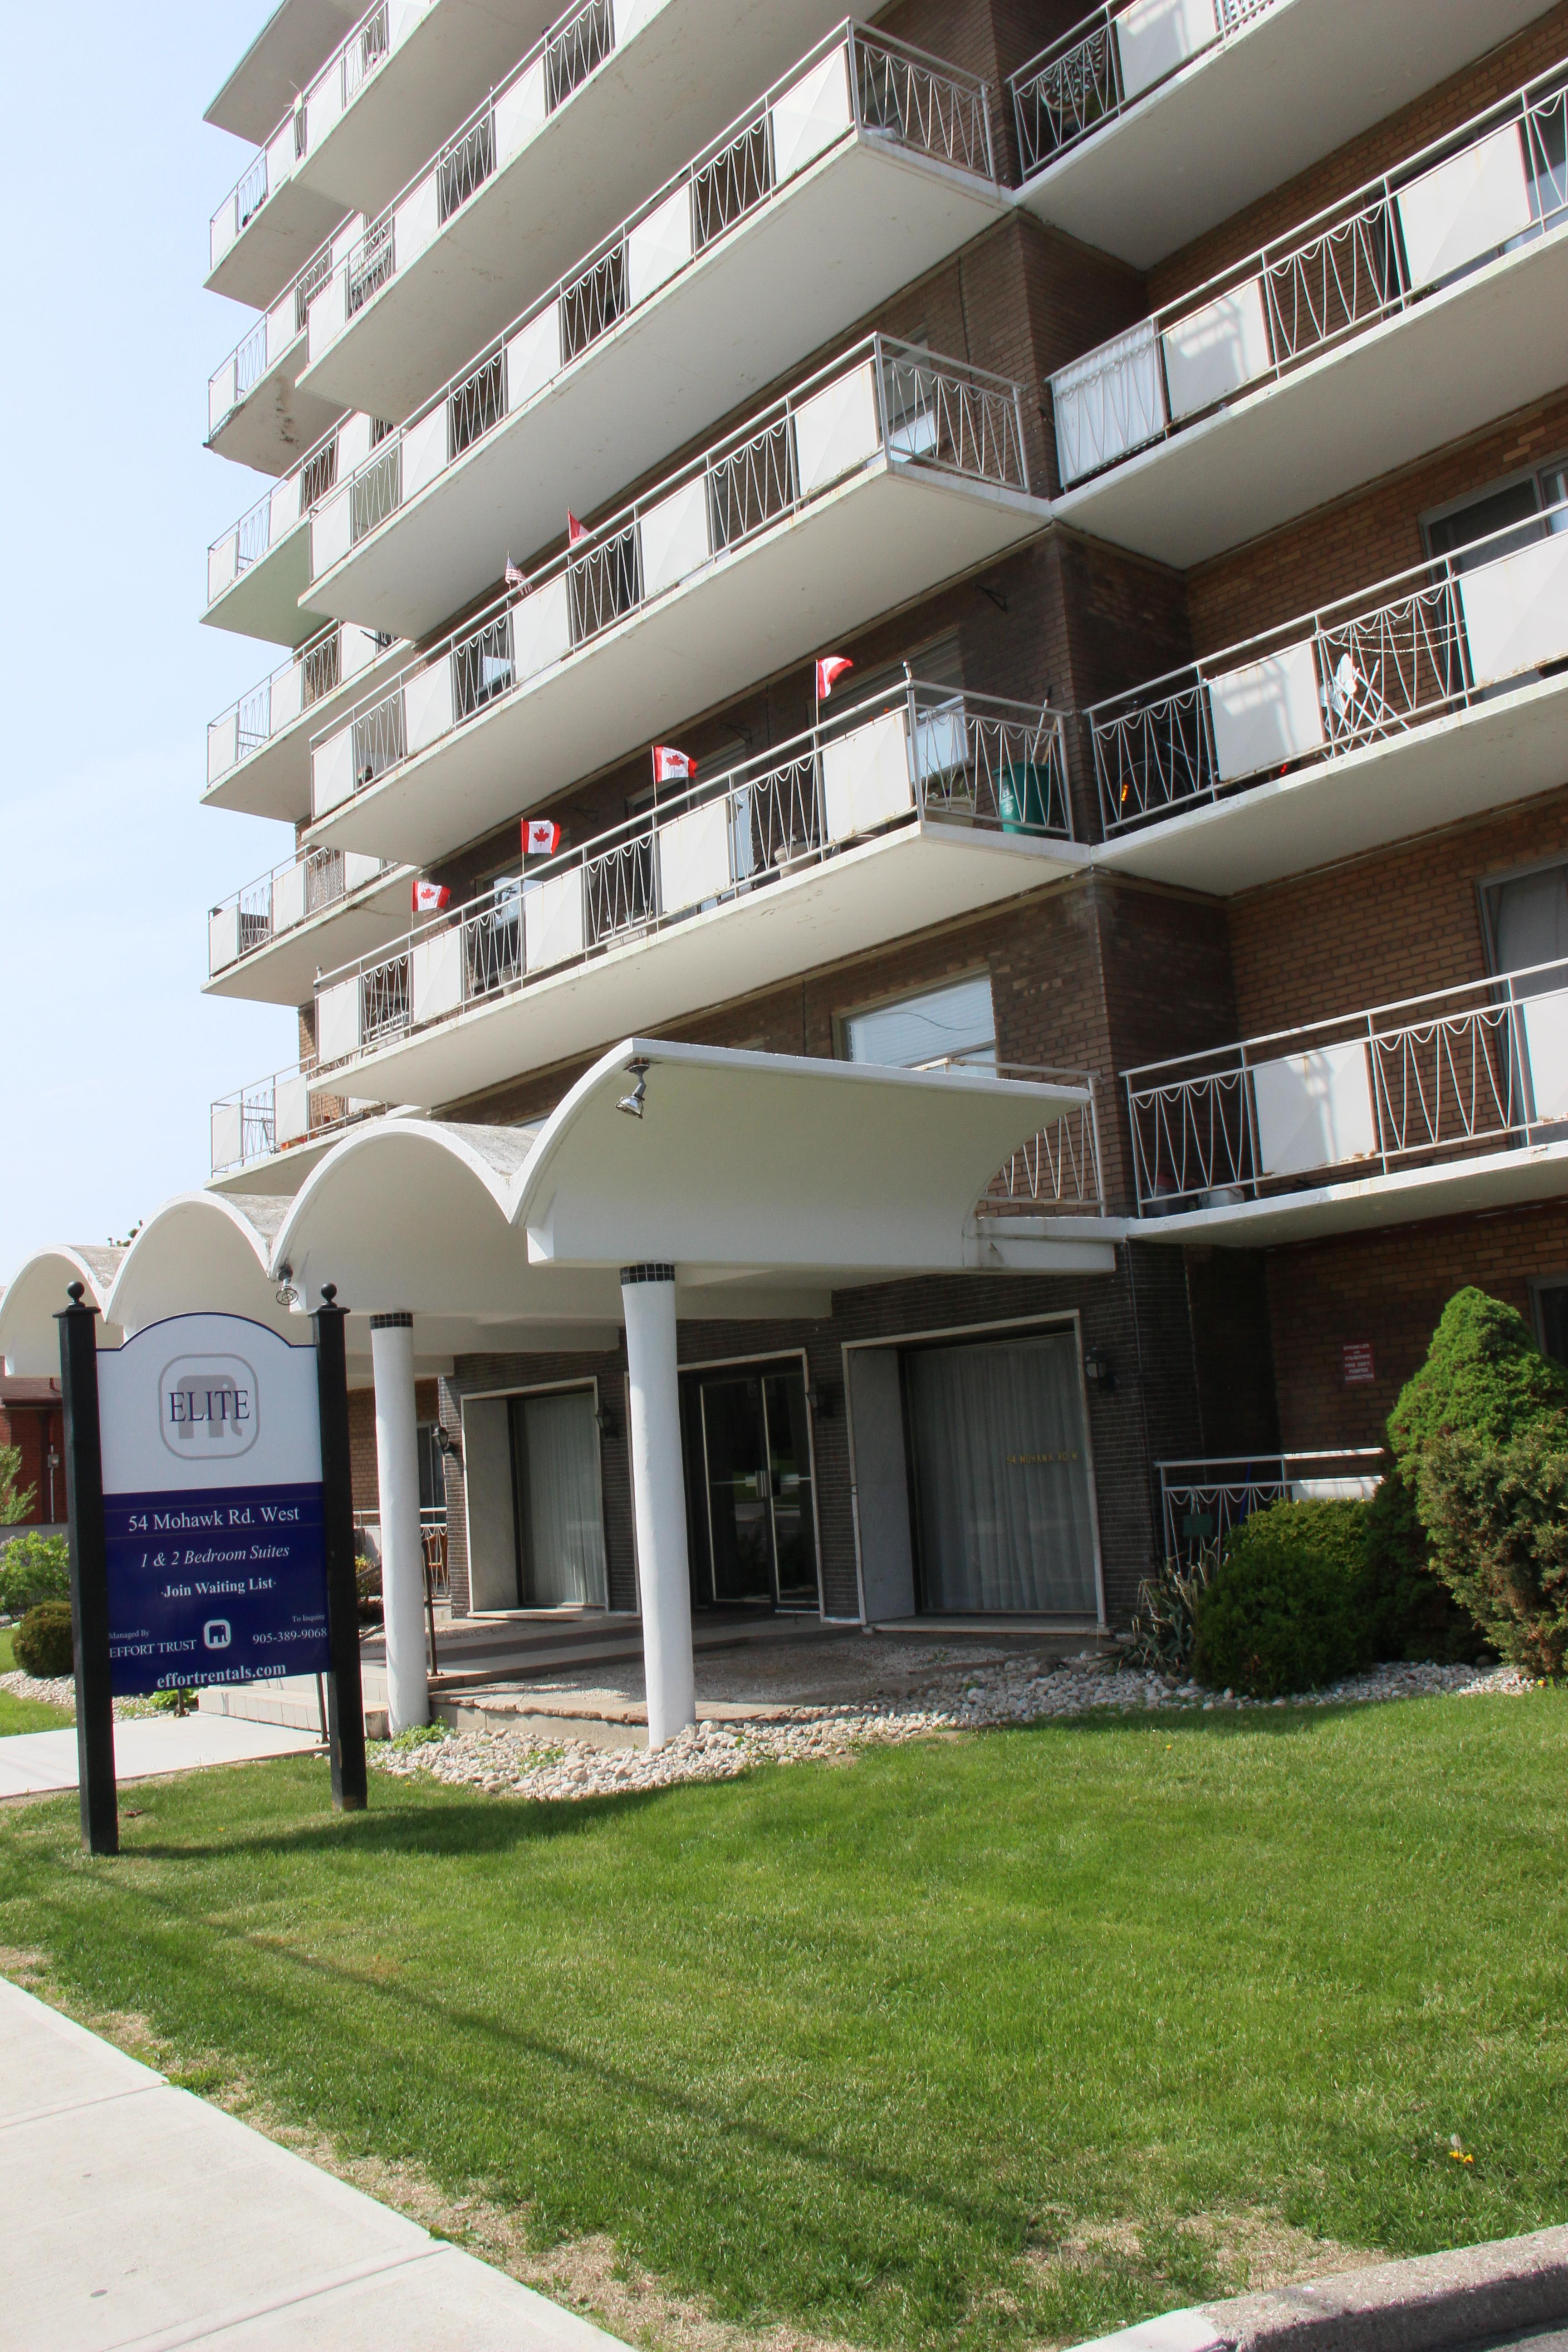 Elite Apartments | 54 Mohawk Rd. W., Hamilton | Effort Trust